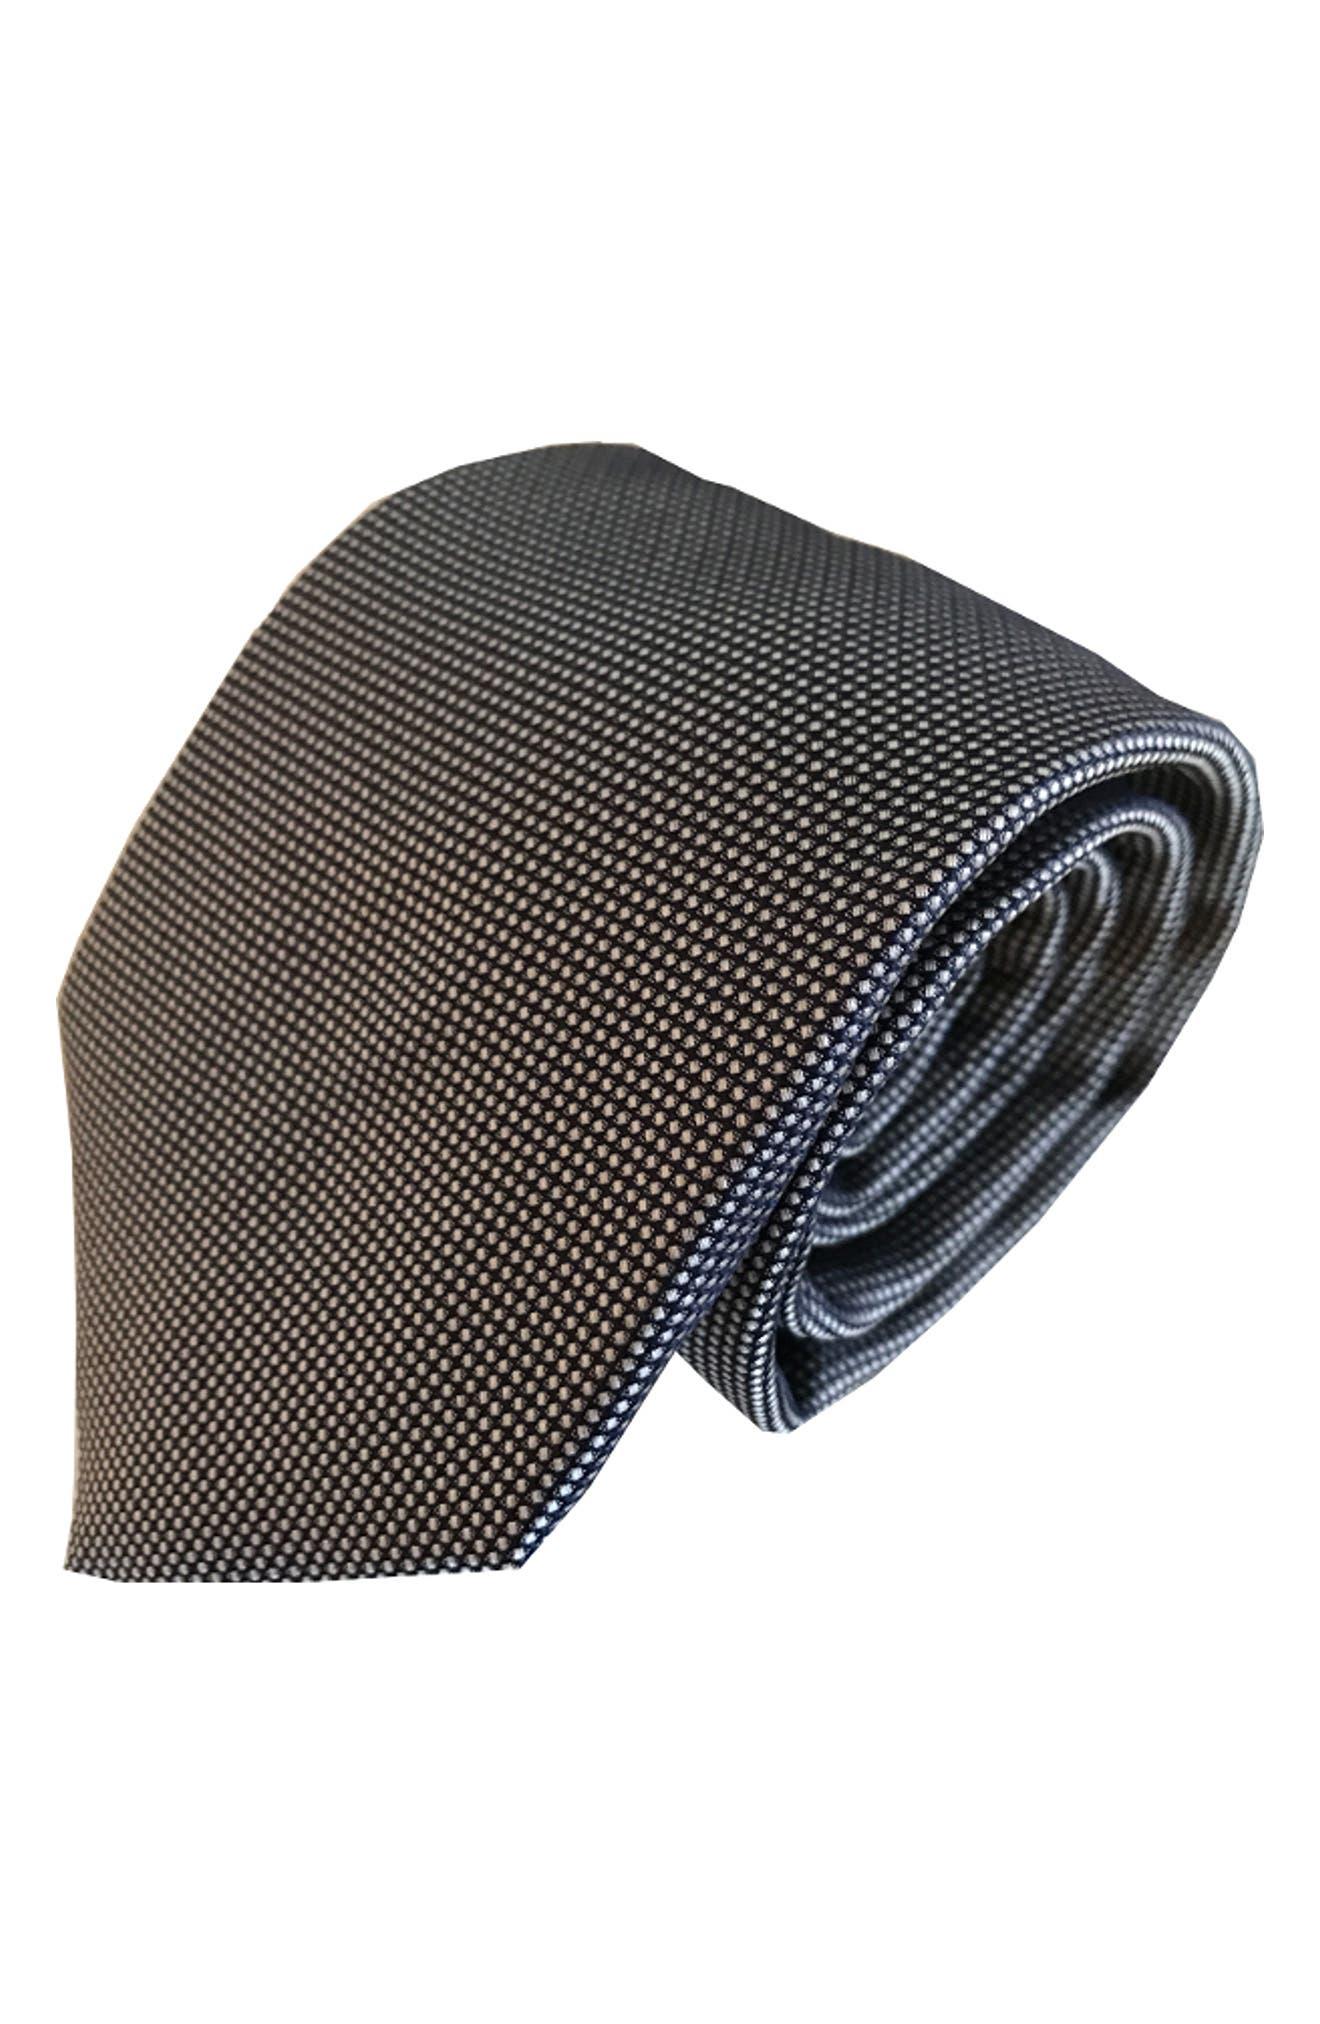 Mullet Silk Tie,                             Main thumbnail 1, color,                             NAVY